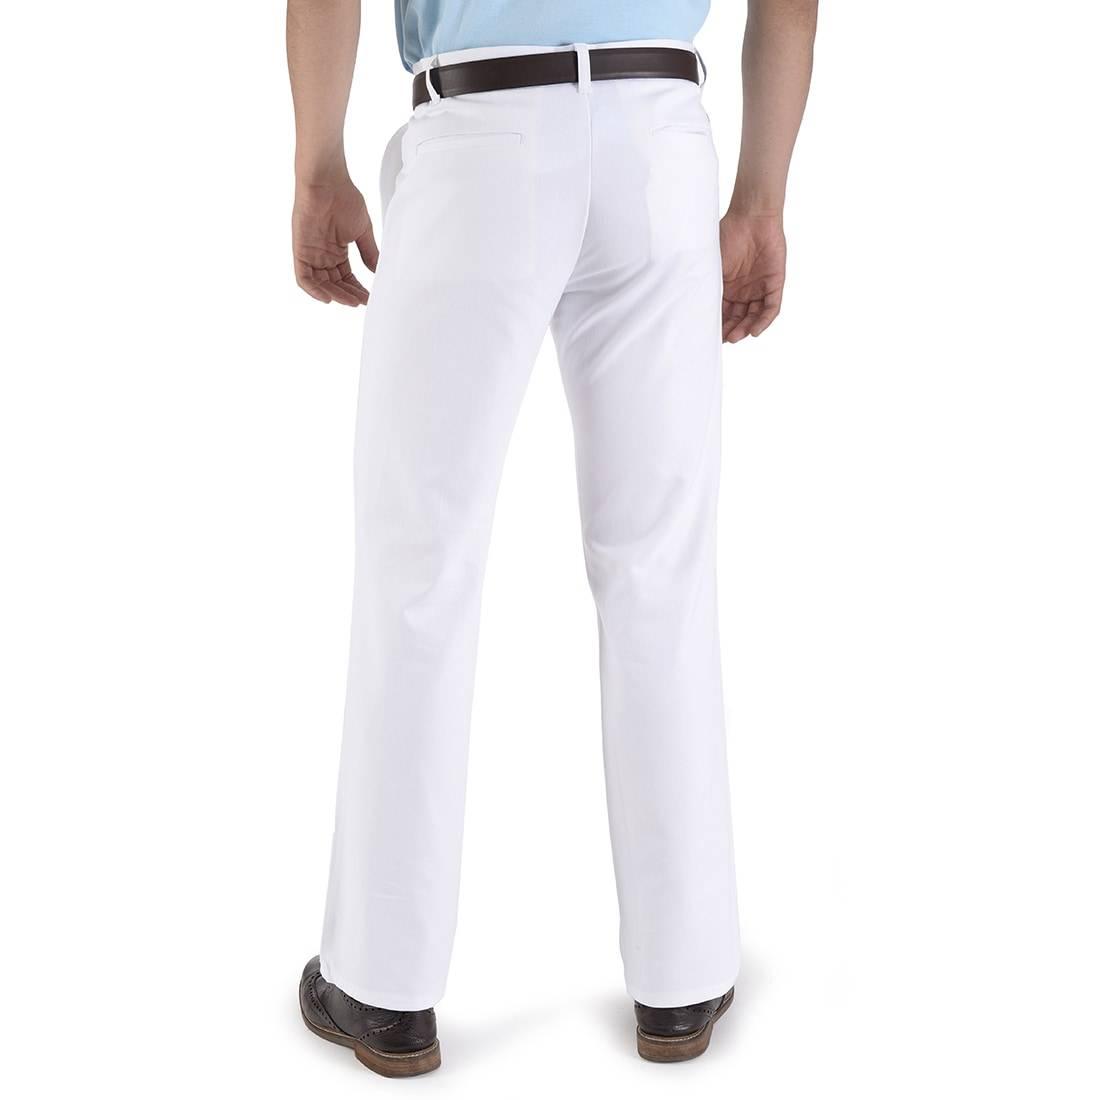 010789055202-02-Pantalon-Casual-Classic-Fit-Blanco-yale